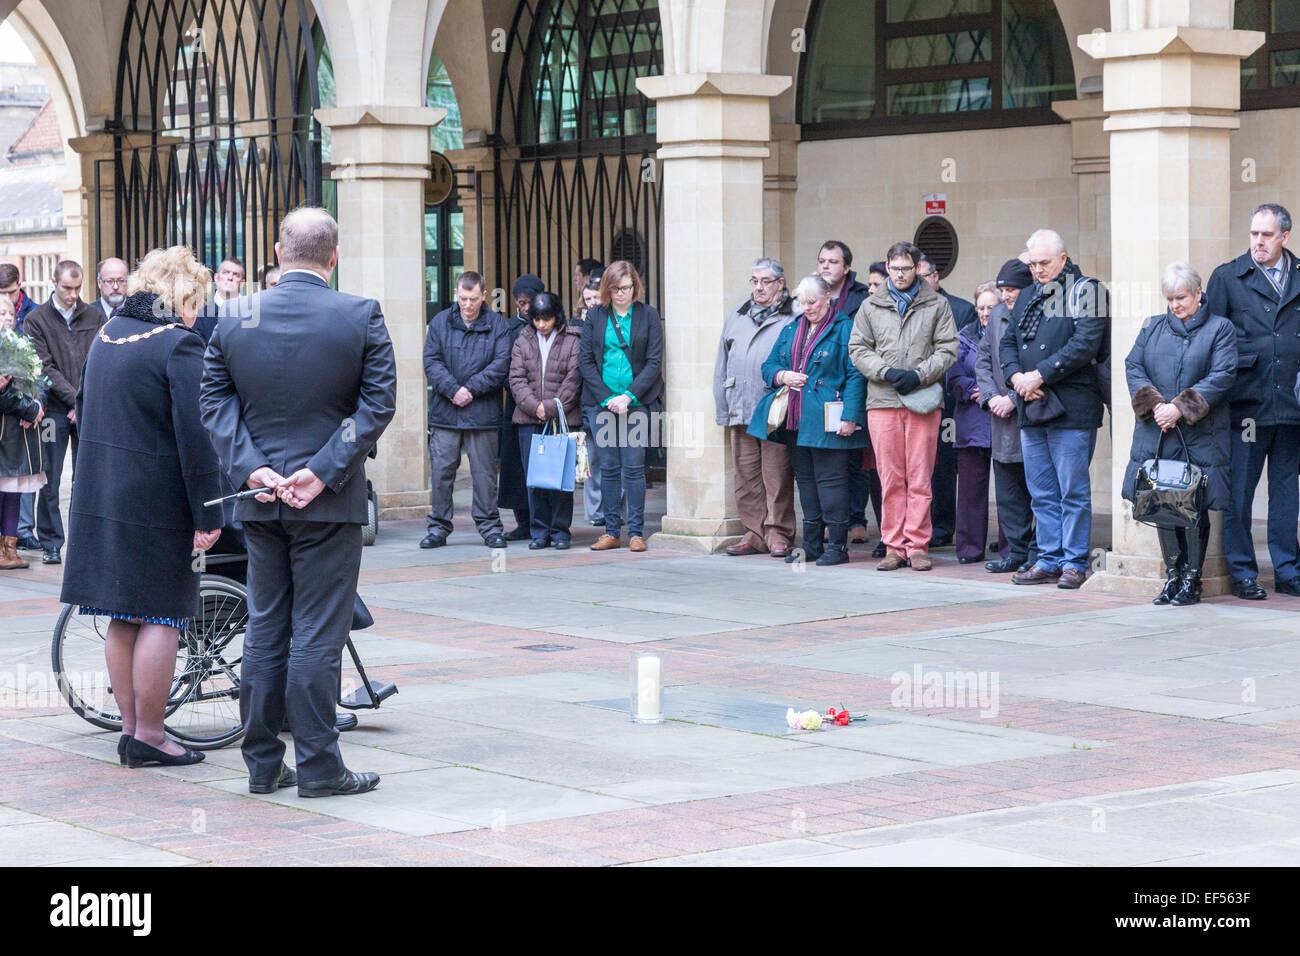 Northampton, UK. 27th January, 2015. 2015 marks the 70th anniversary of the liberation of Auschwitz-Birkenau and - Stock Image